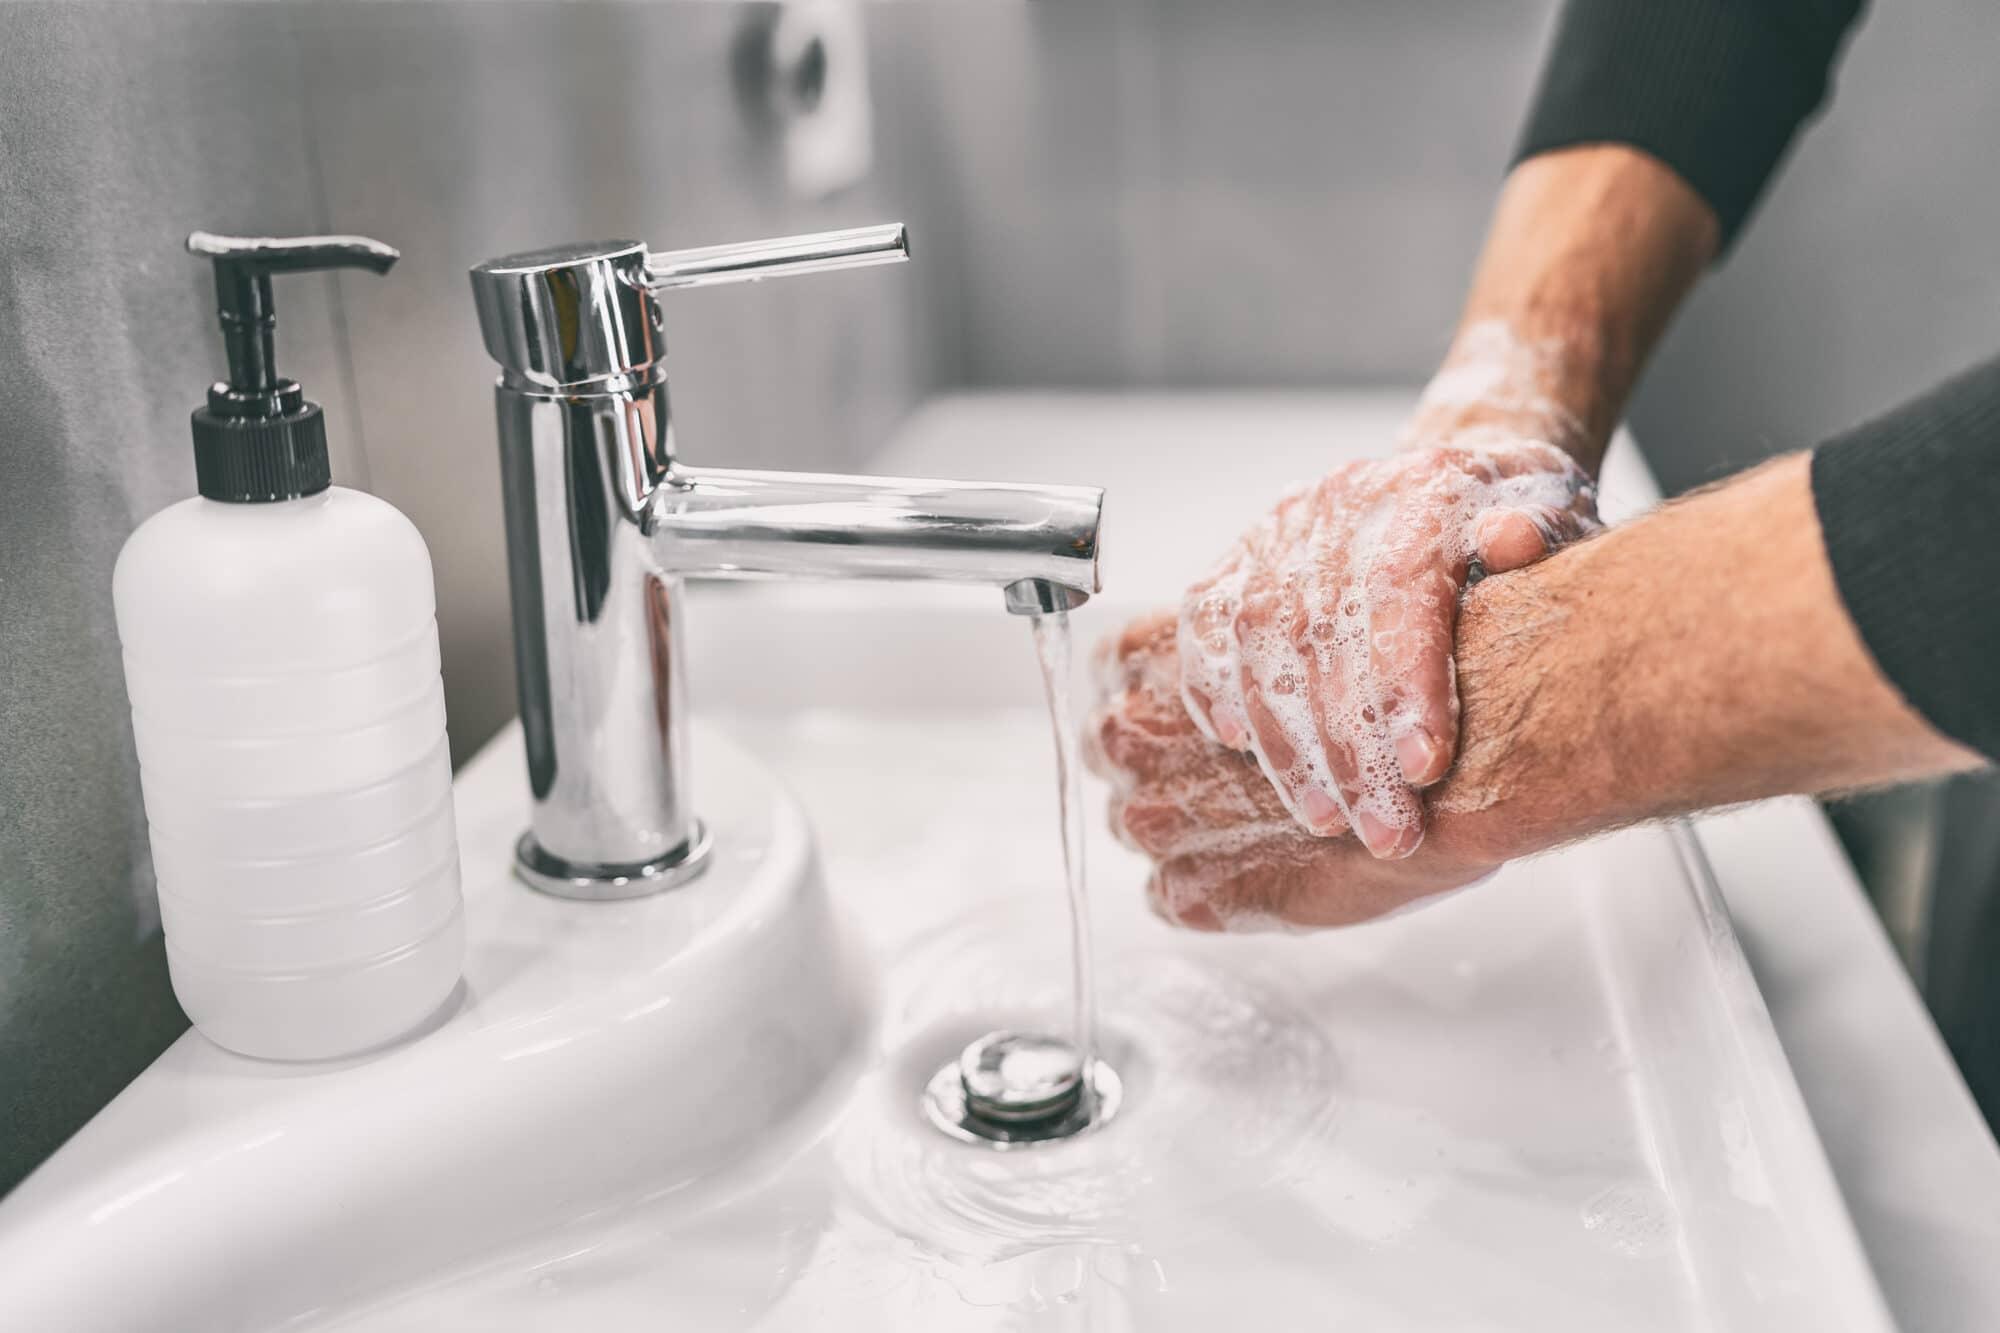 Hands hygiene